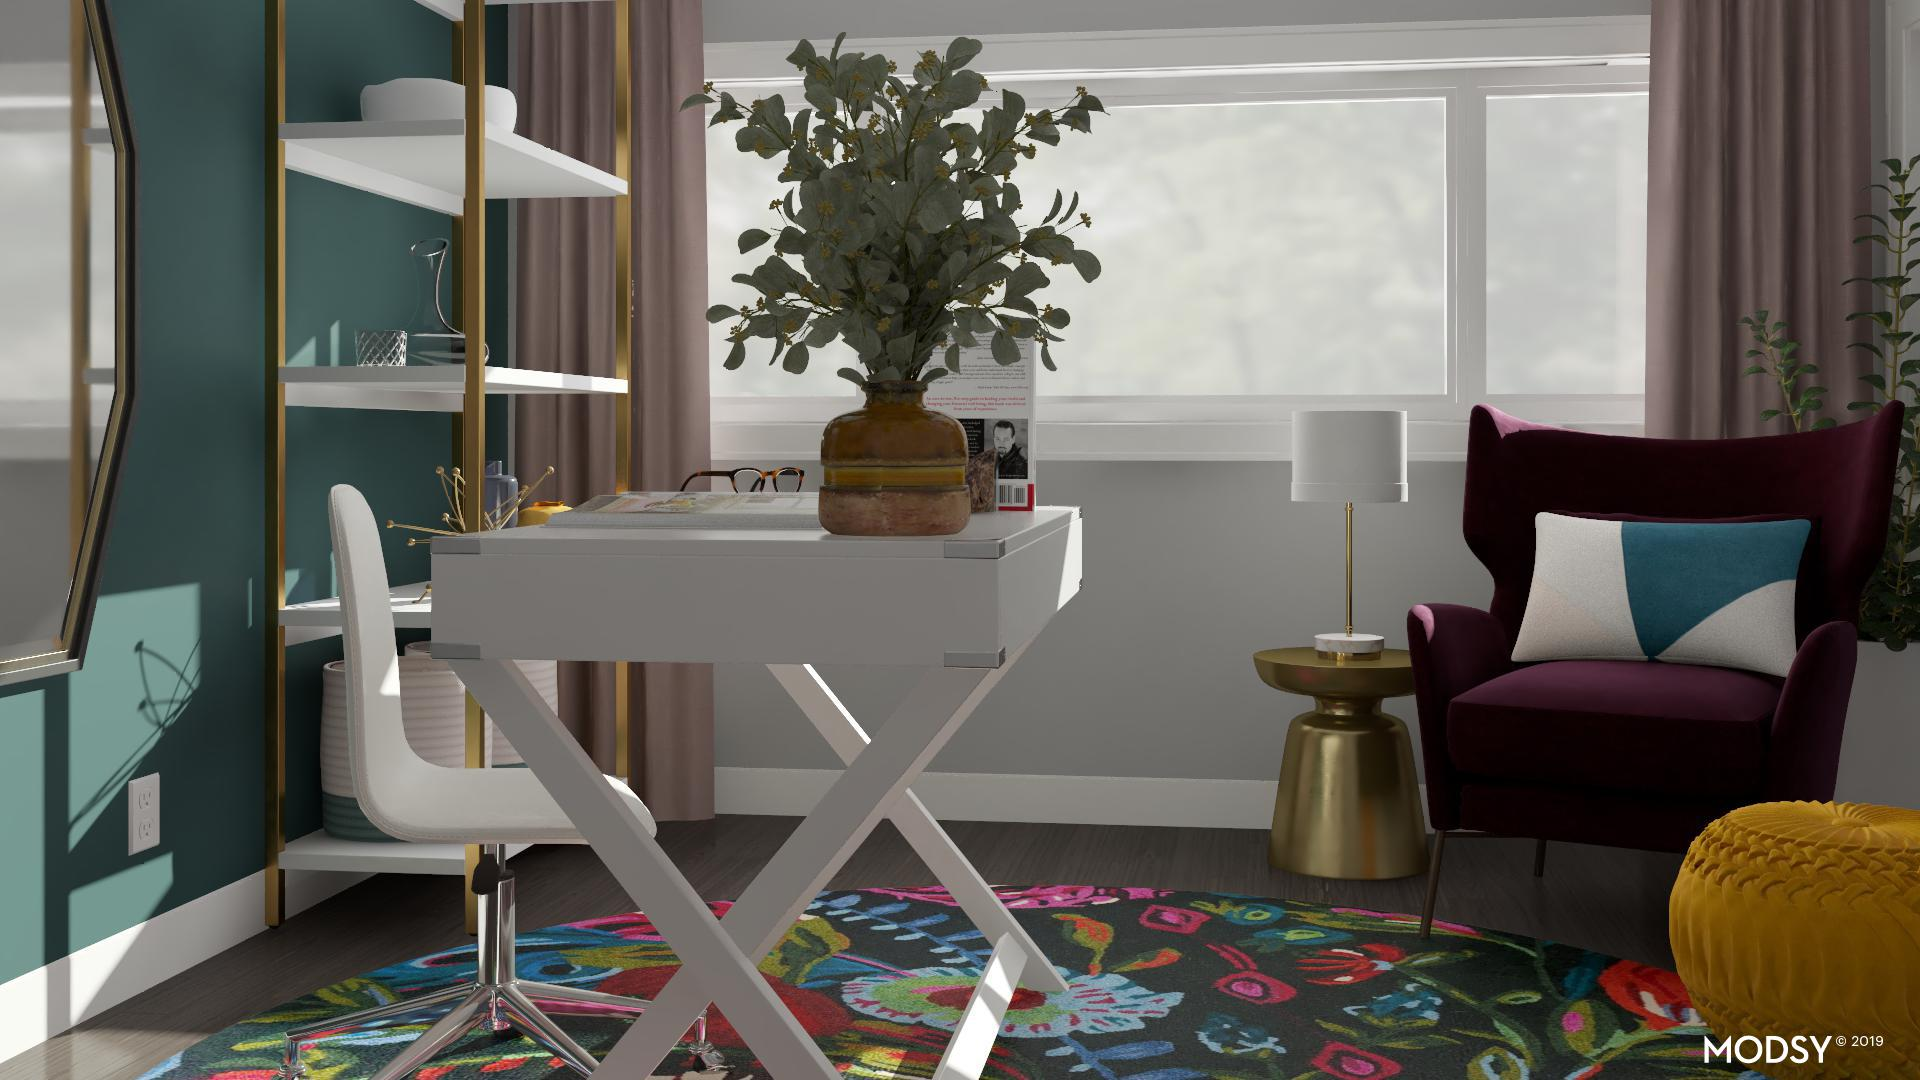 Mod Jewel Tone Accent Chair In Feminine Office Mid Century Modern Style Home Office Design Ideas